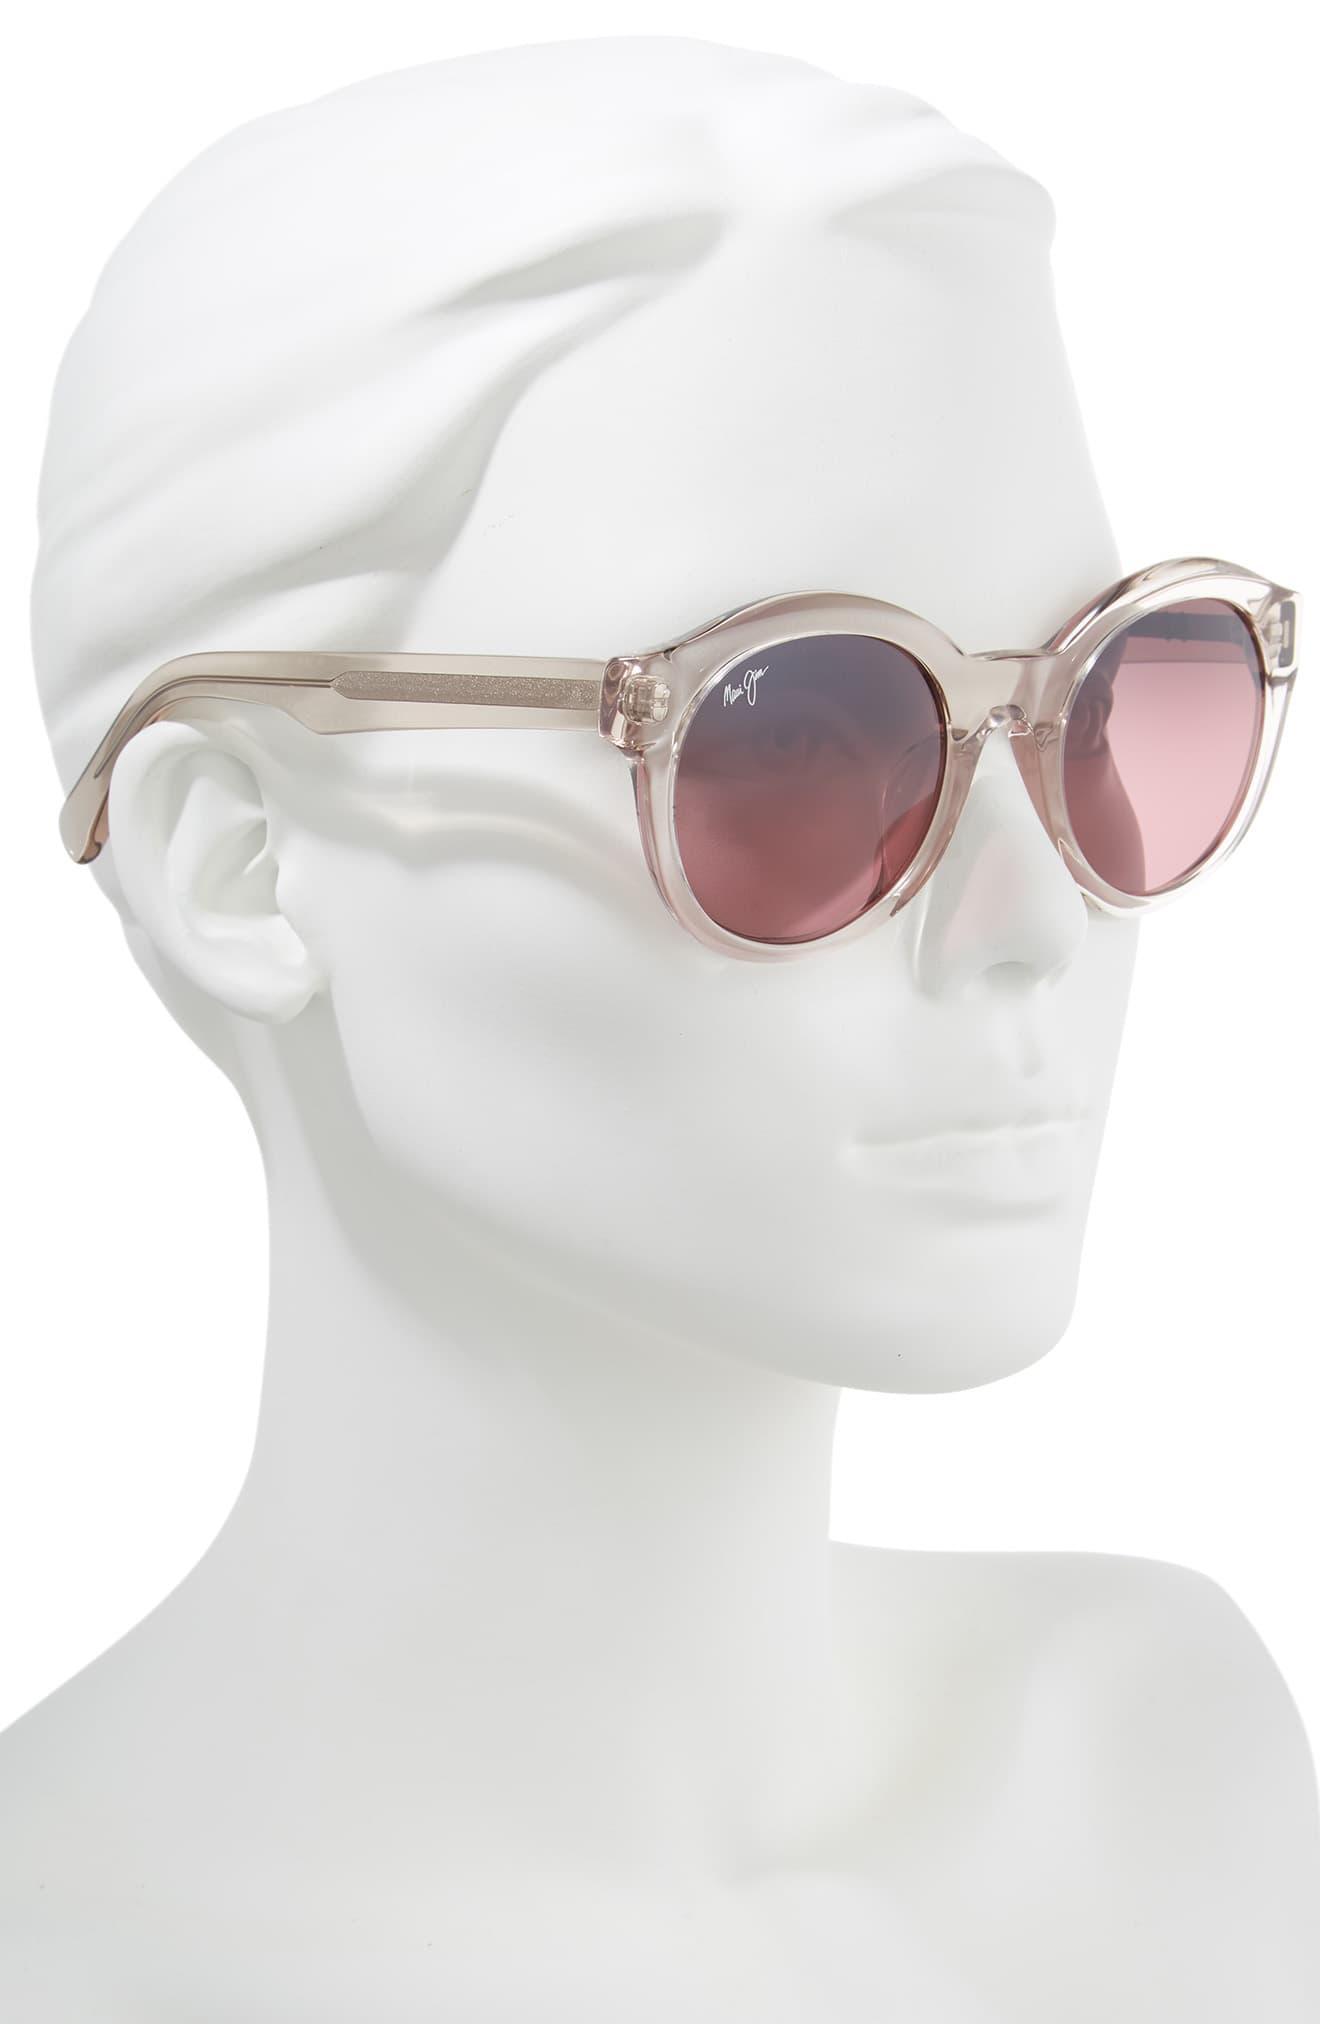 b87e32fef8 Maui Jim Jasmine 51mm Polarizedplus2 Round Sunglasses - Crystal Pink ...